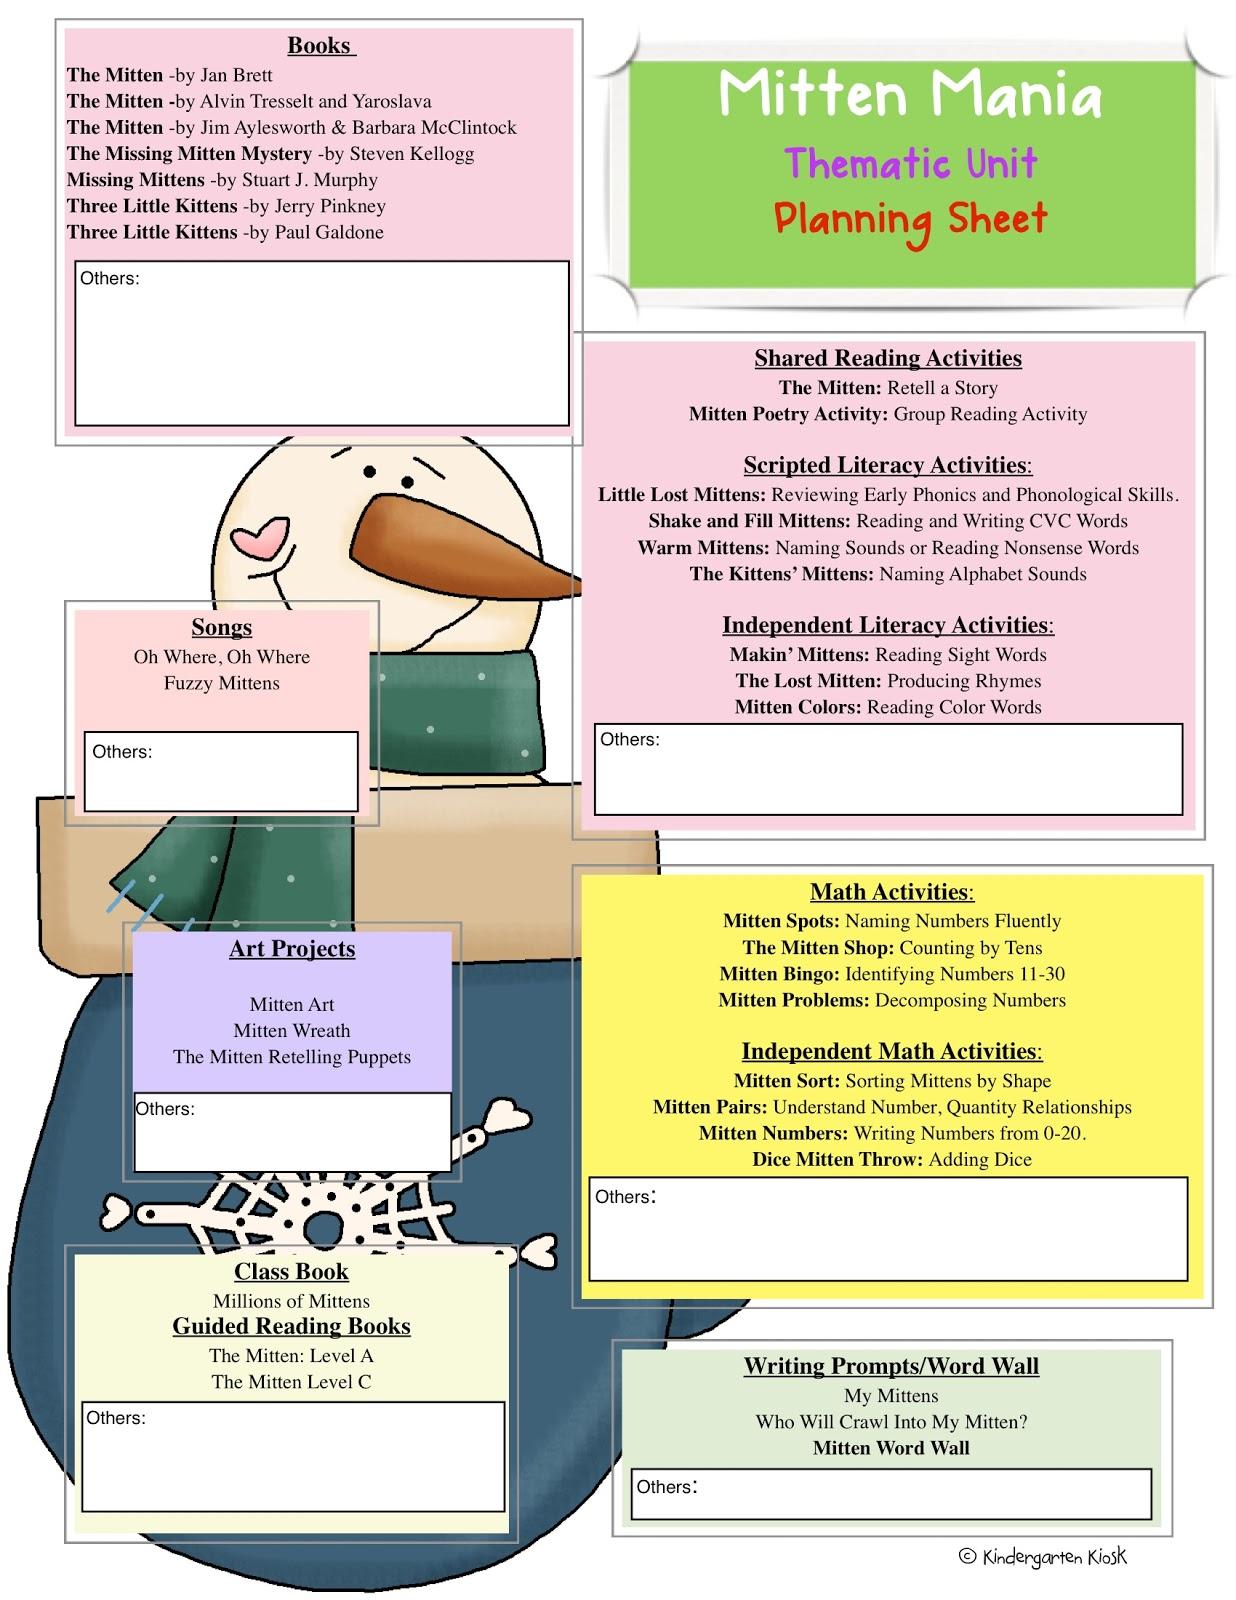 Kindergarten Kiosk Mitten Mania Thematic Common Core Curriculum